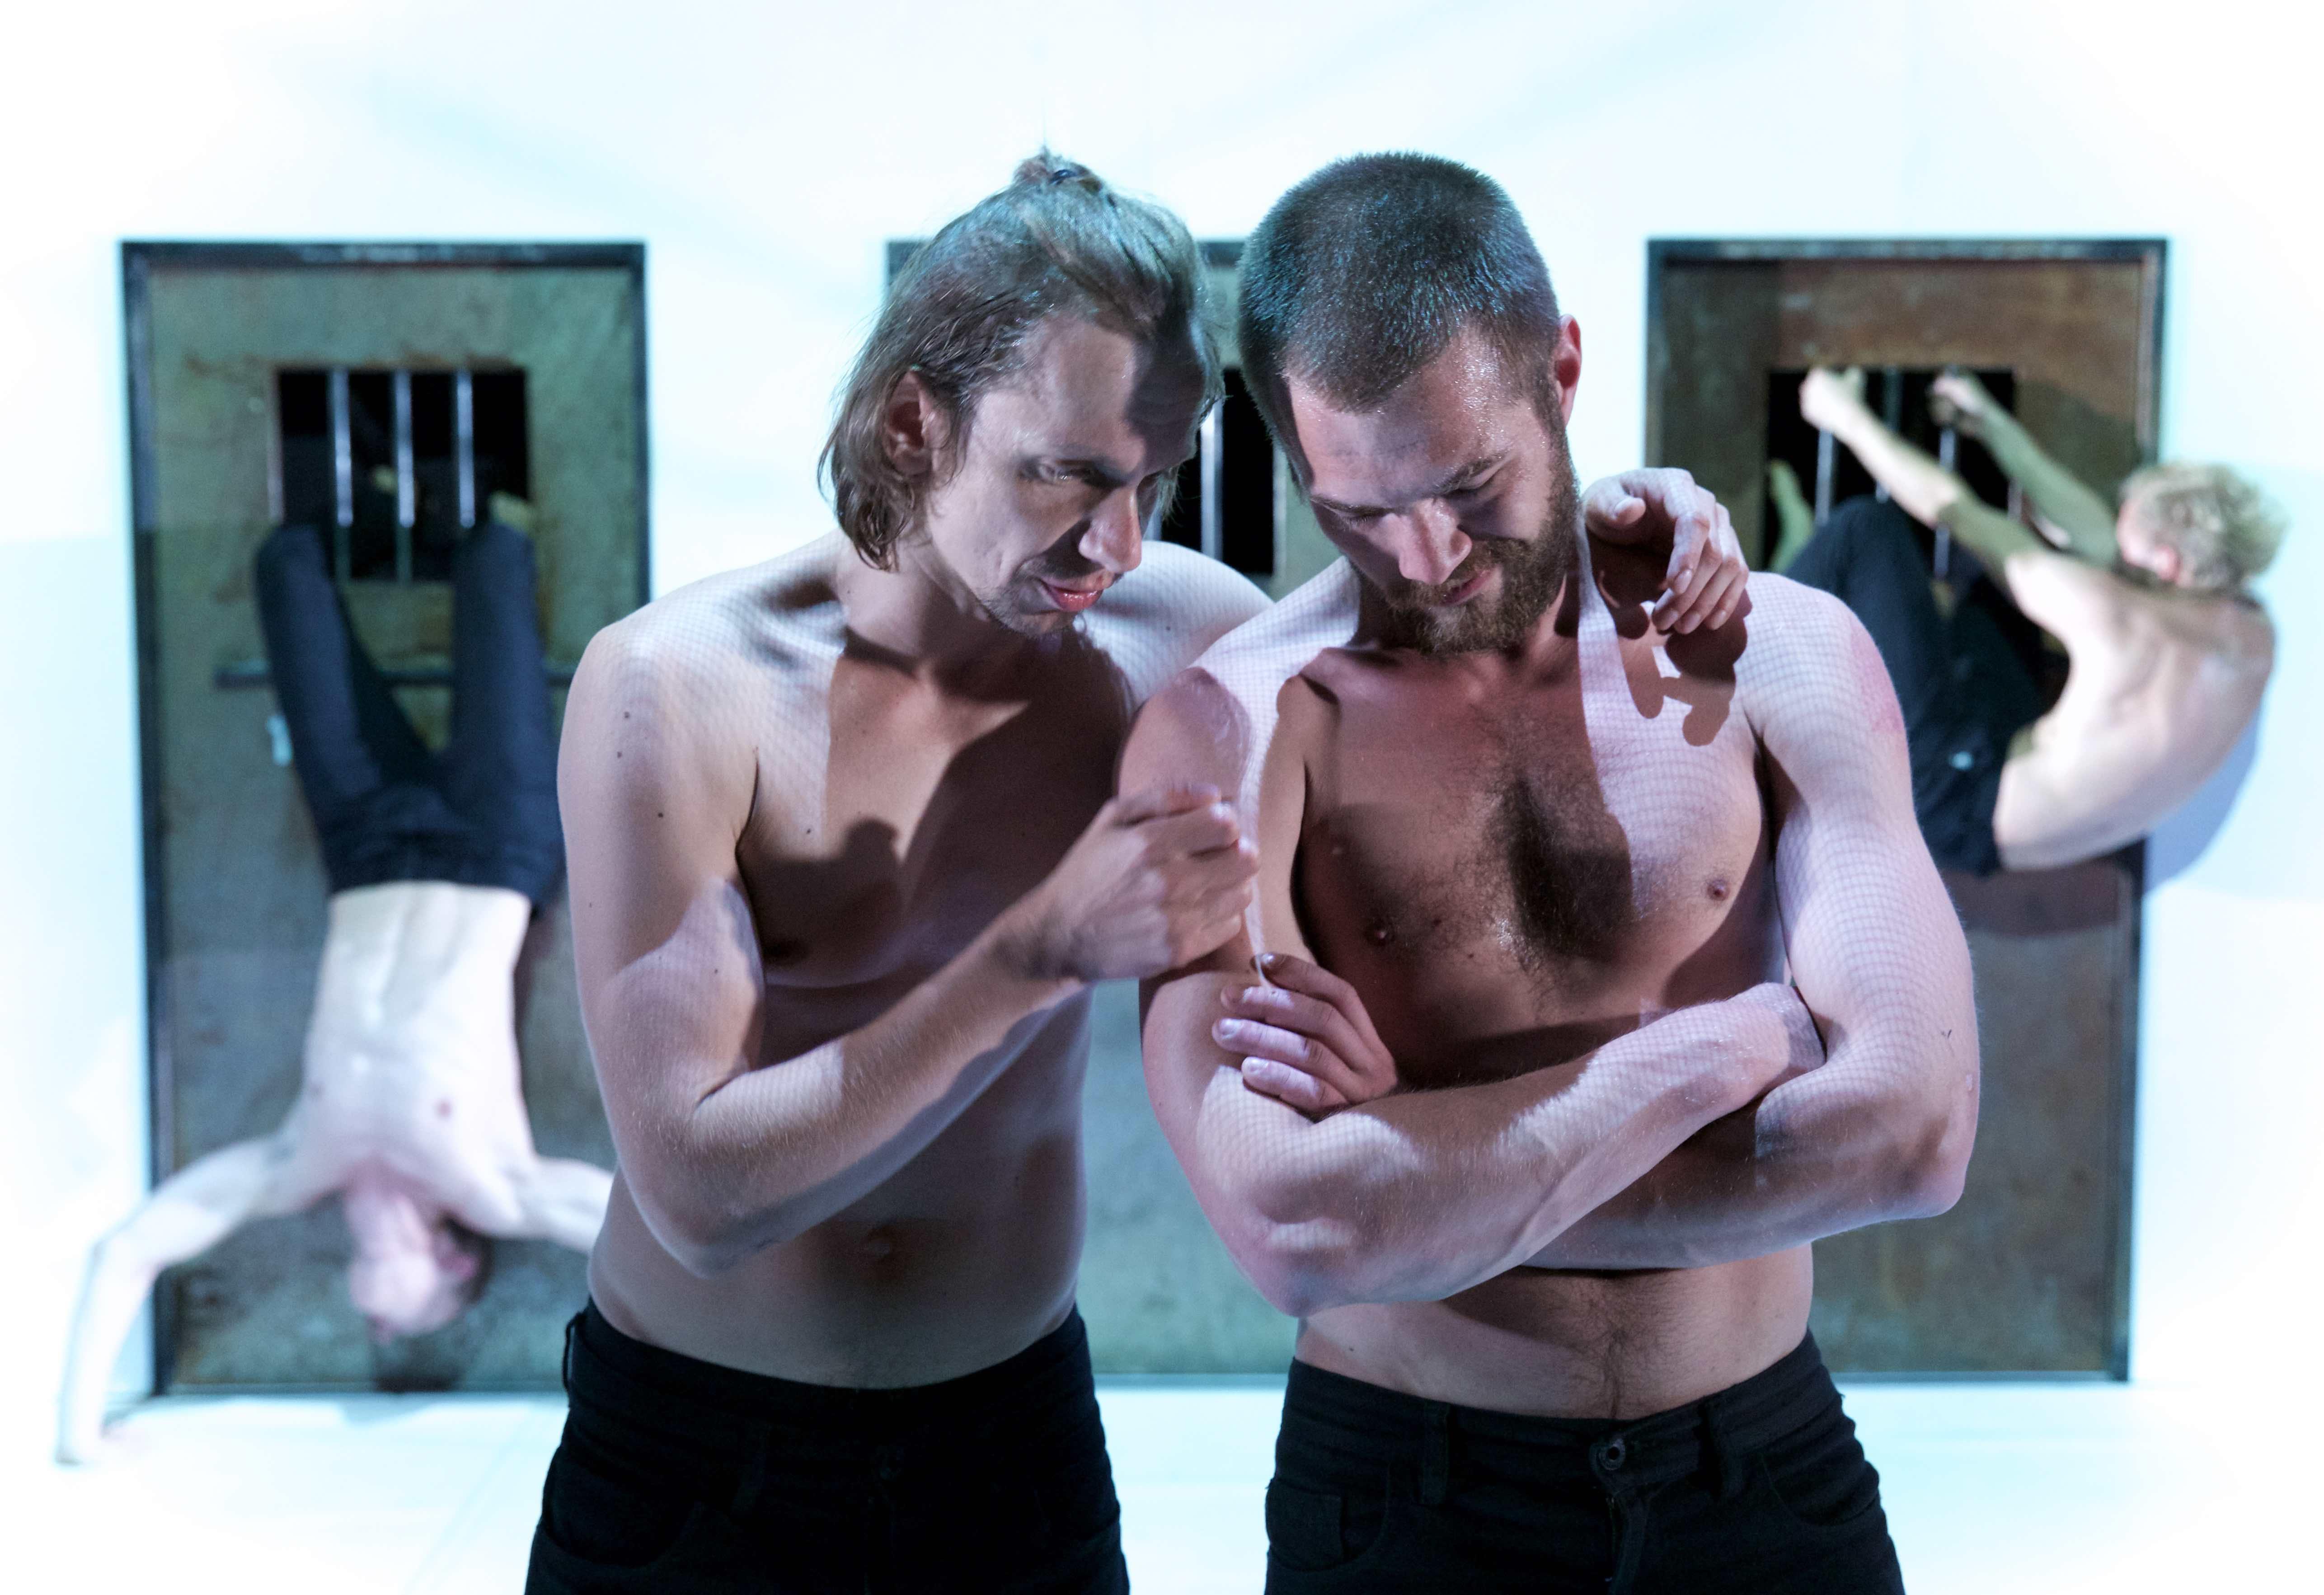 (c) Nicolai Khalezin, Belarus Free Theatre - Burning Doors. Pavel Haradnitski and Kiryl Kanstantsinau